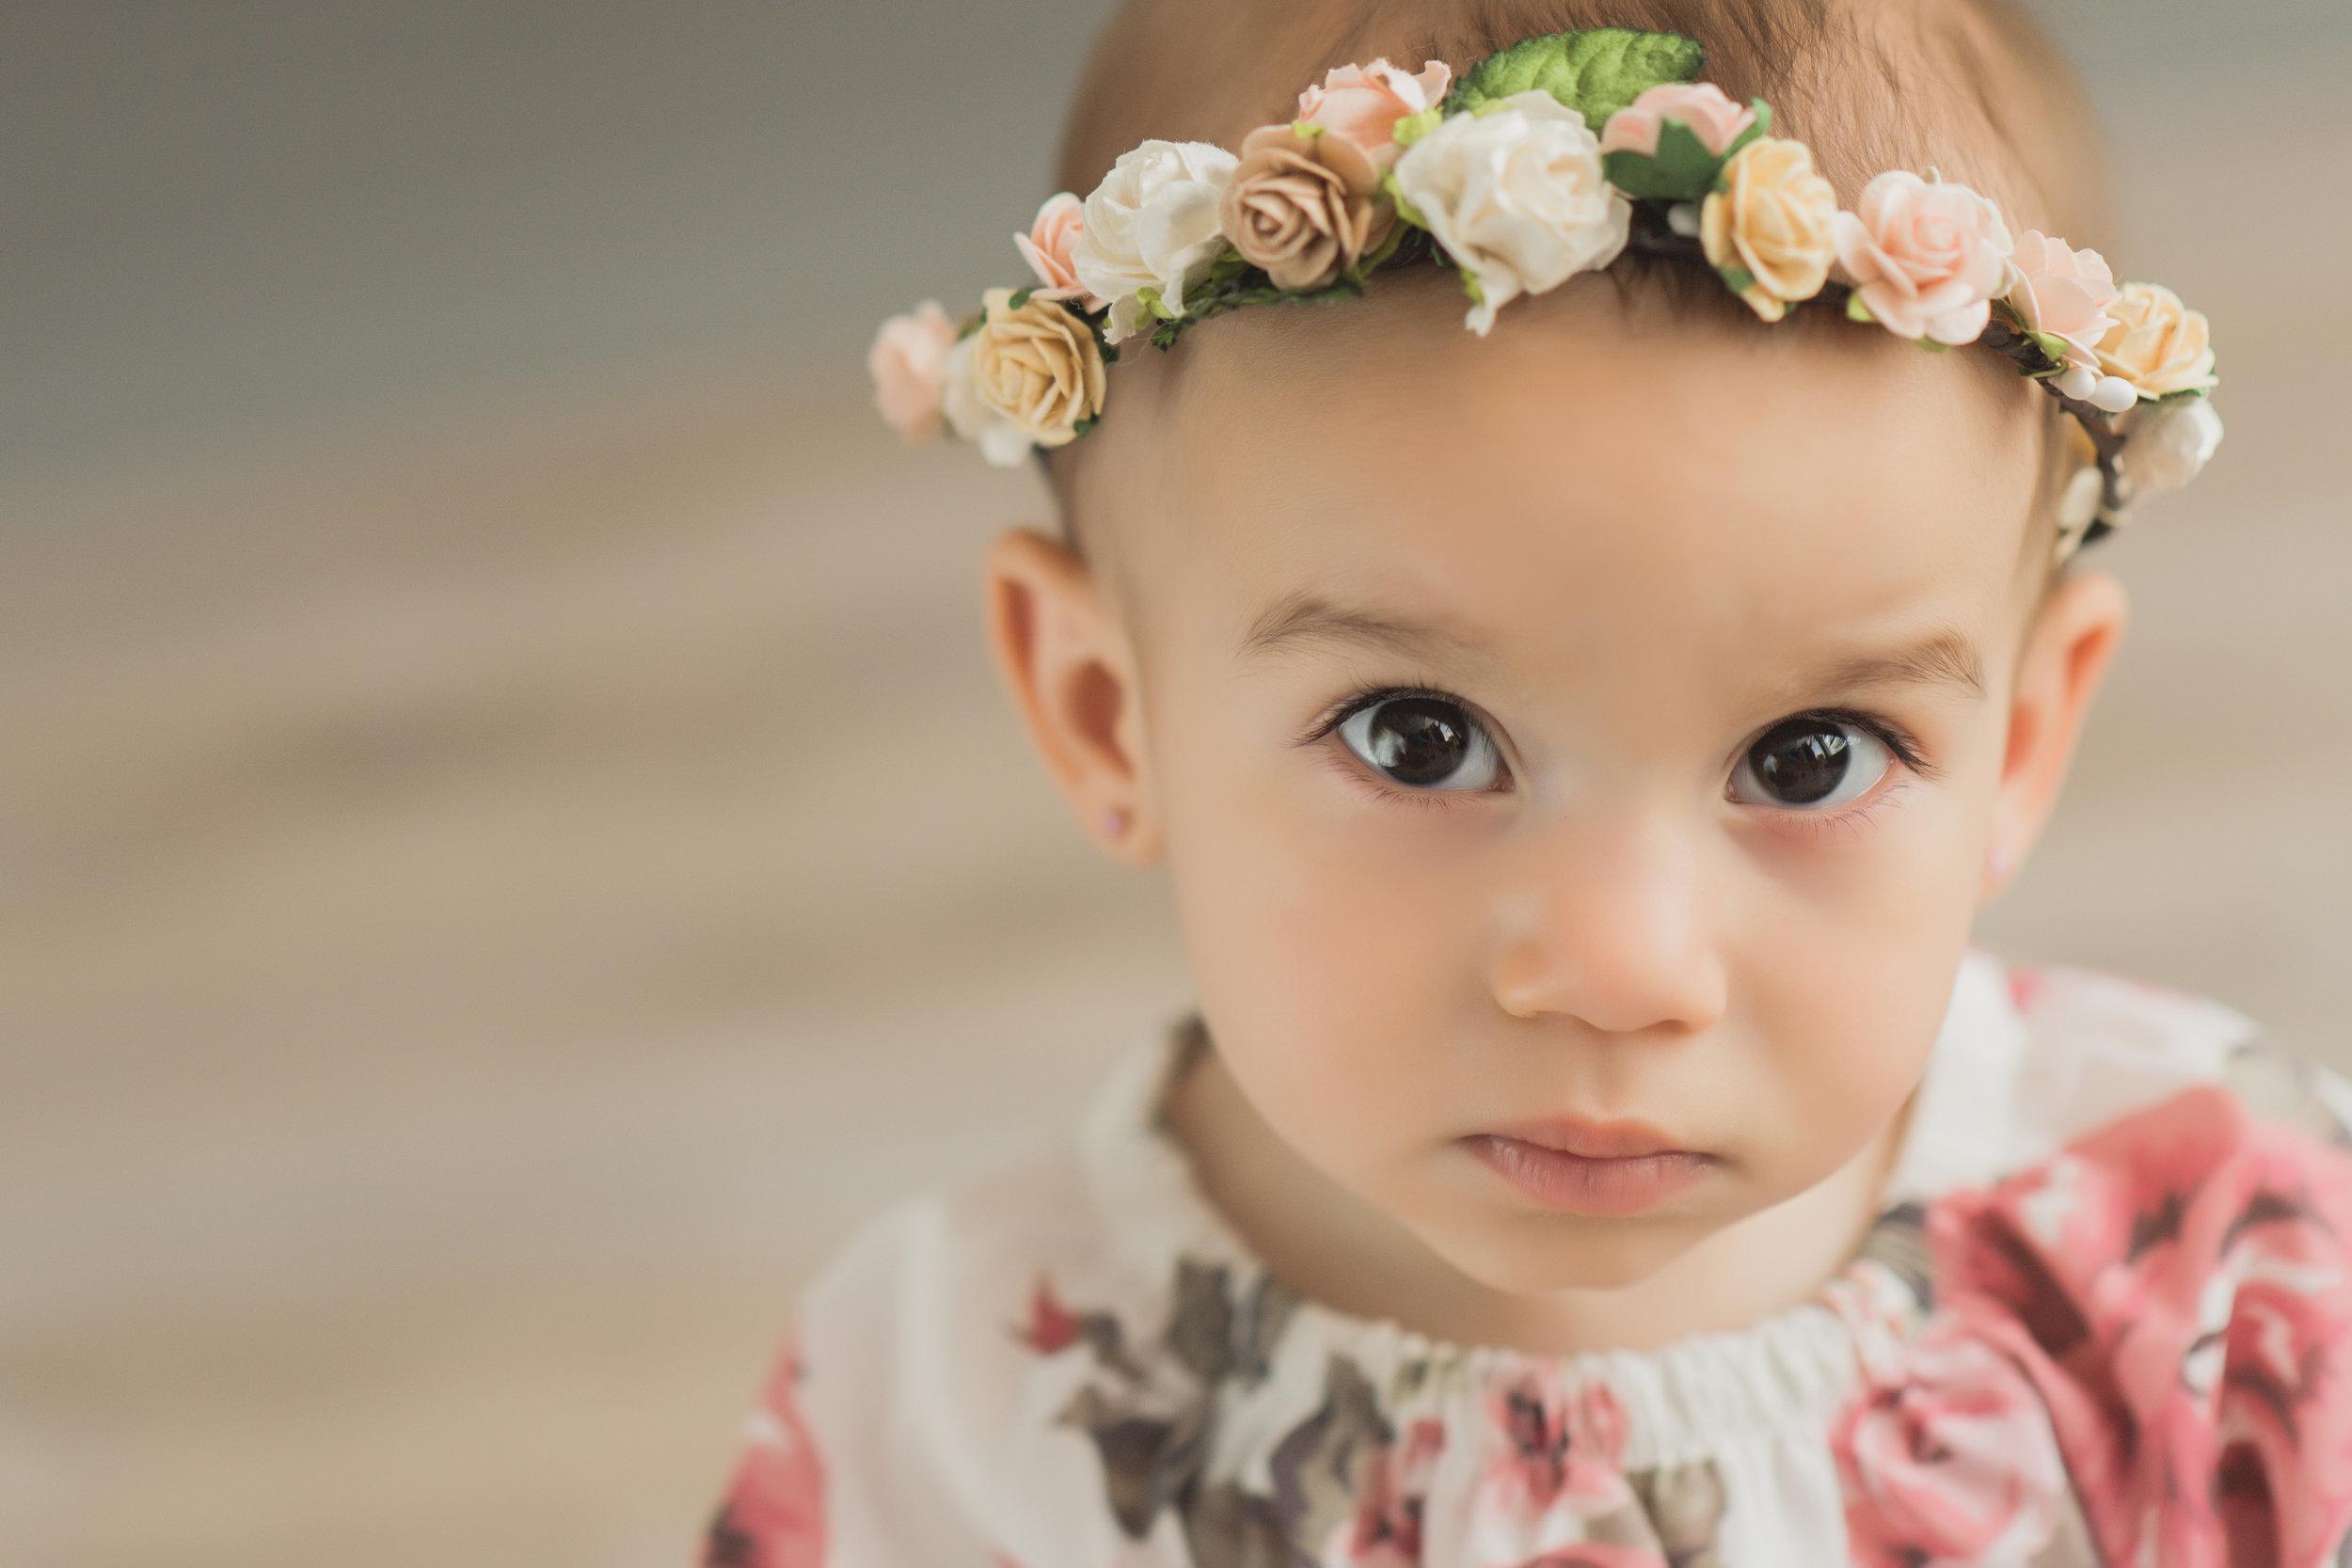 2017 Cutest Baby in NH winner!